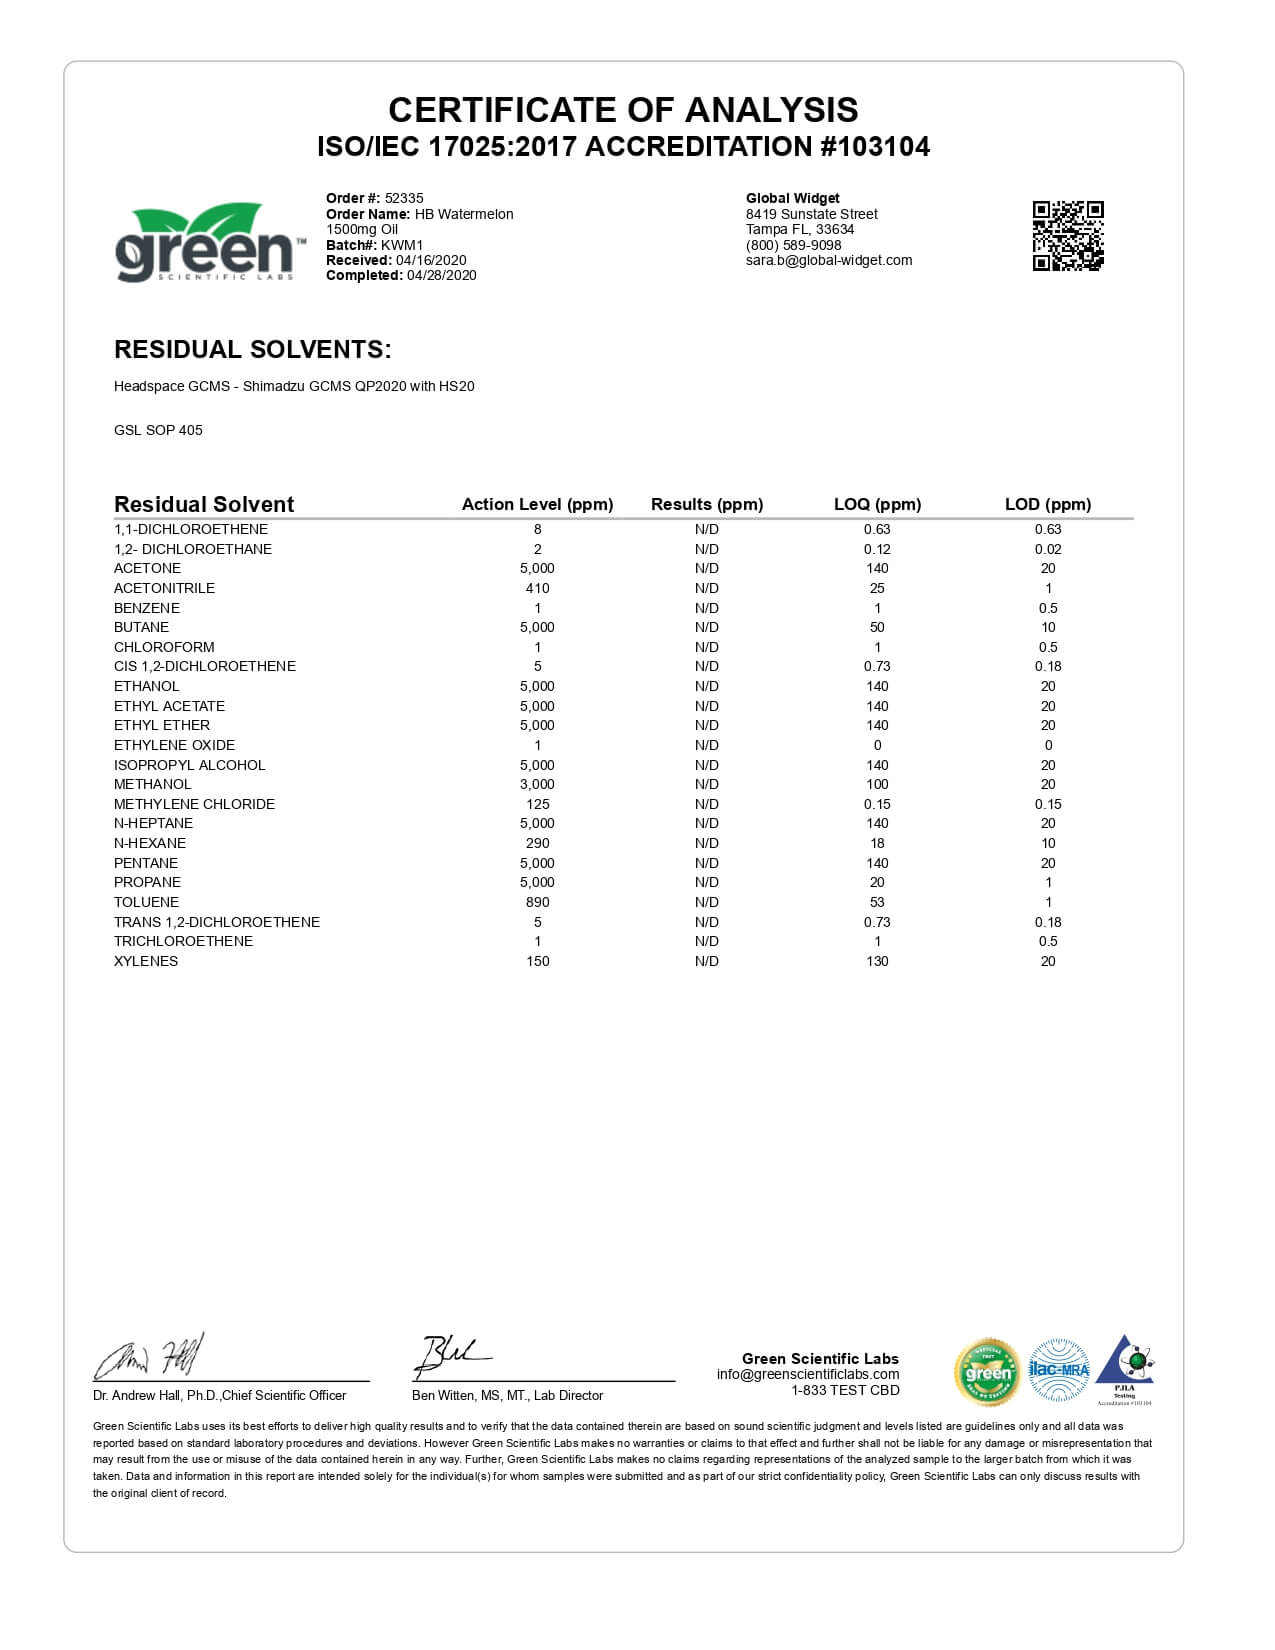 Hemp Bombs CBD Tincture Watermelon 1500mg Lab Report